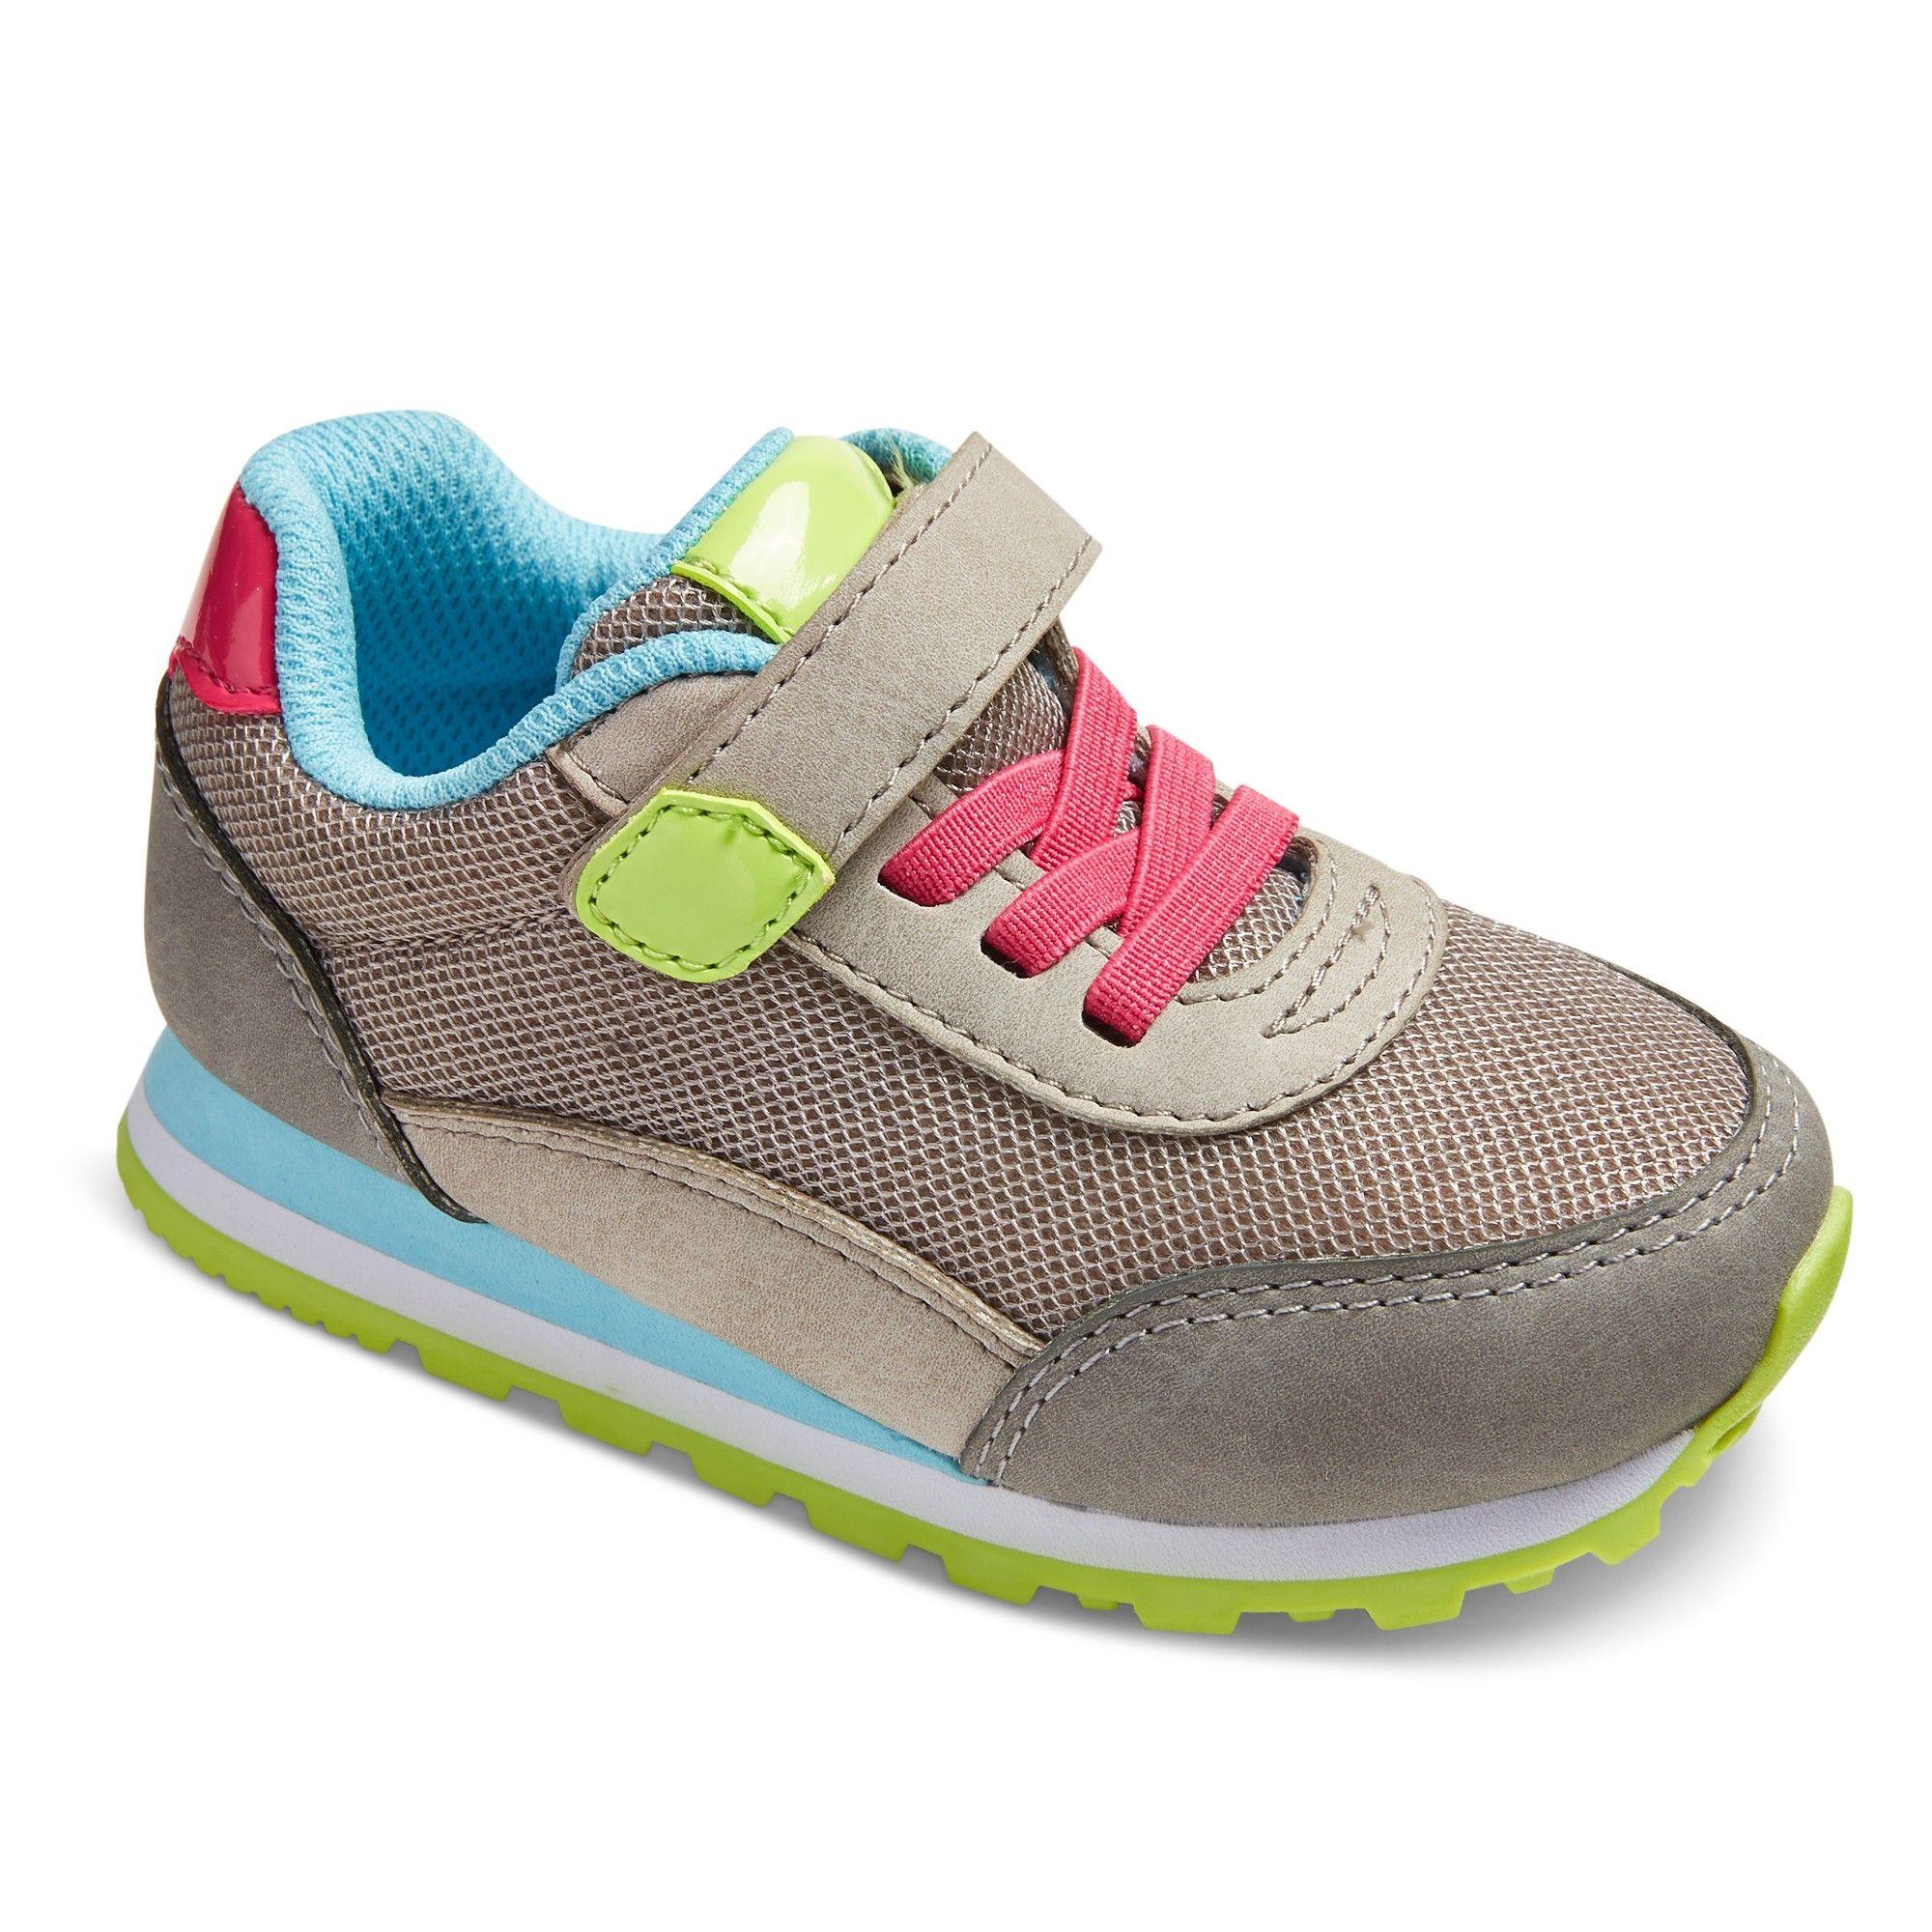 Toddler Girls Tabatha Sneakers 12 Cat & Jack Gray